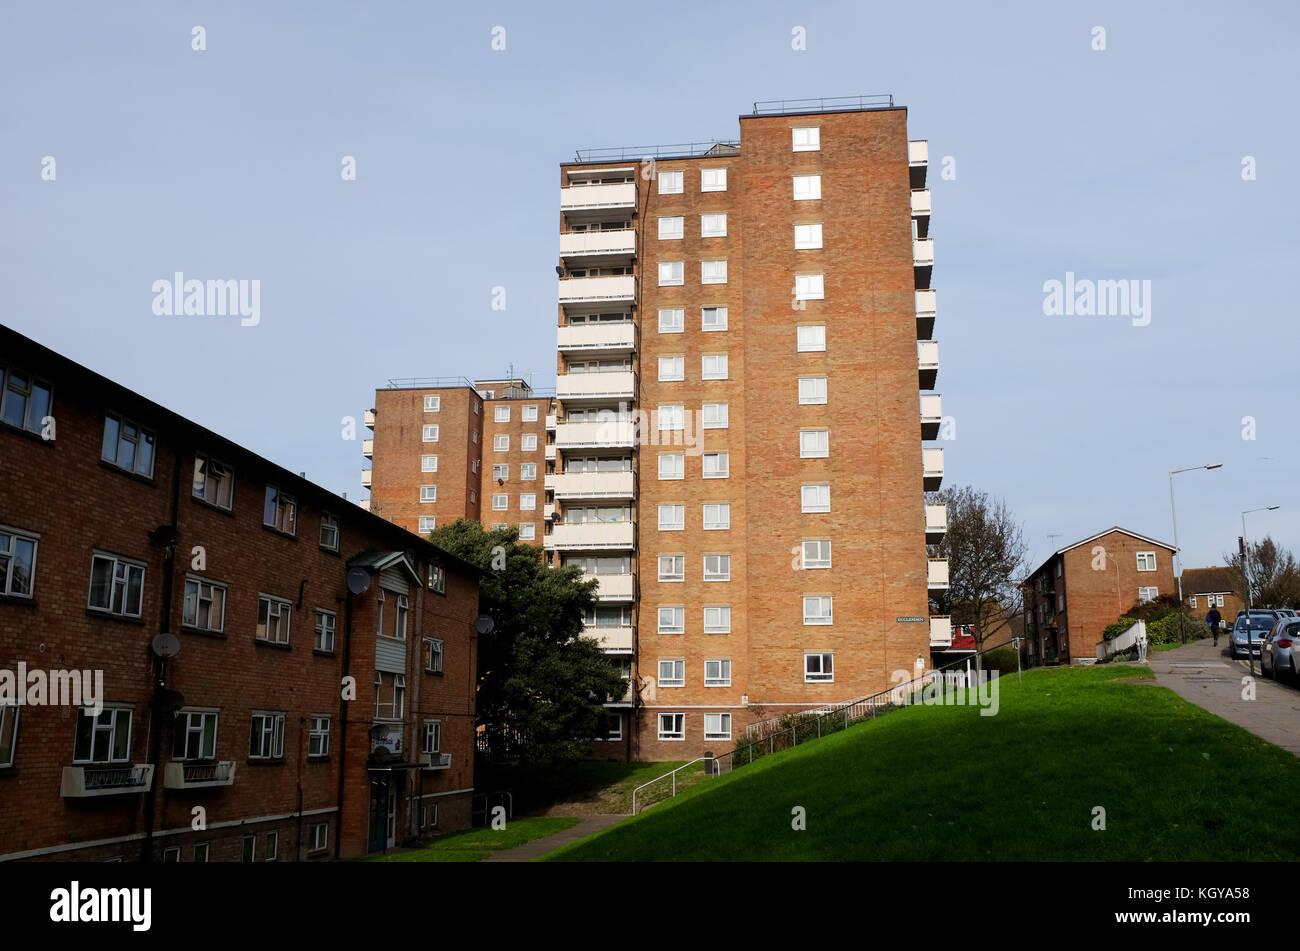 Ecclesden tower block of flats in Brighton Stock Photo